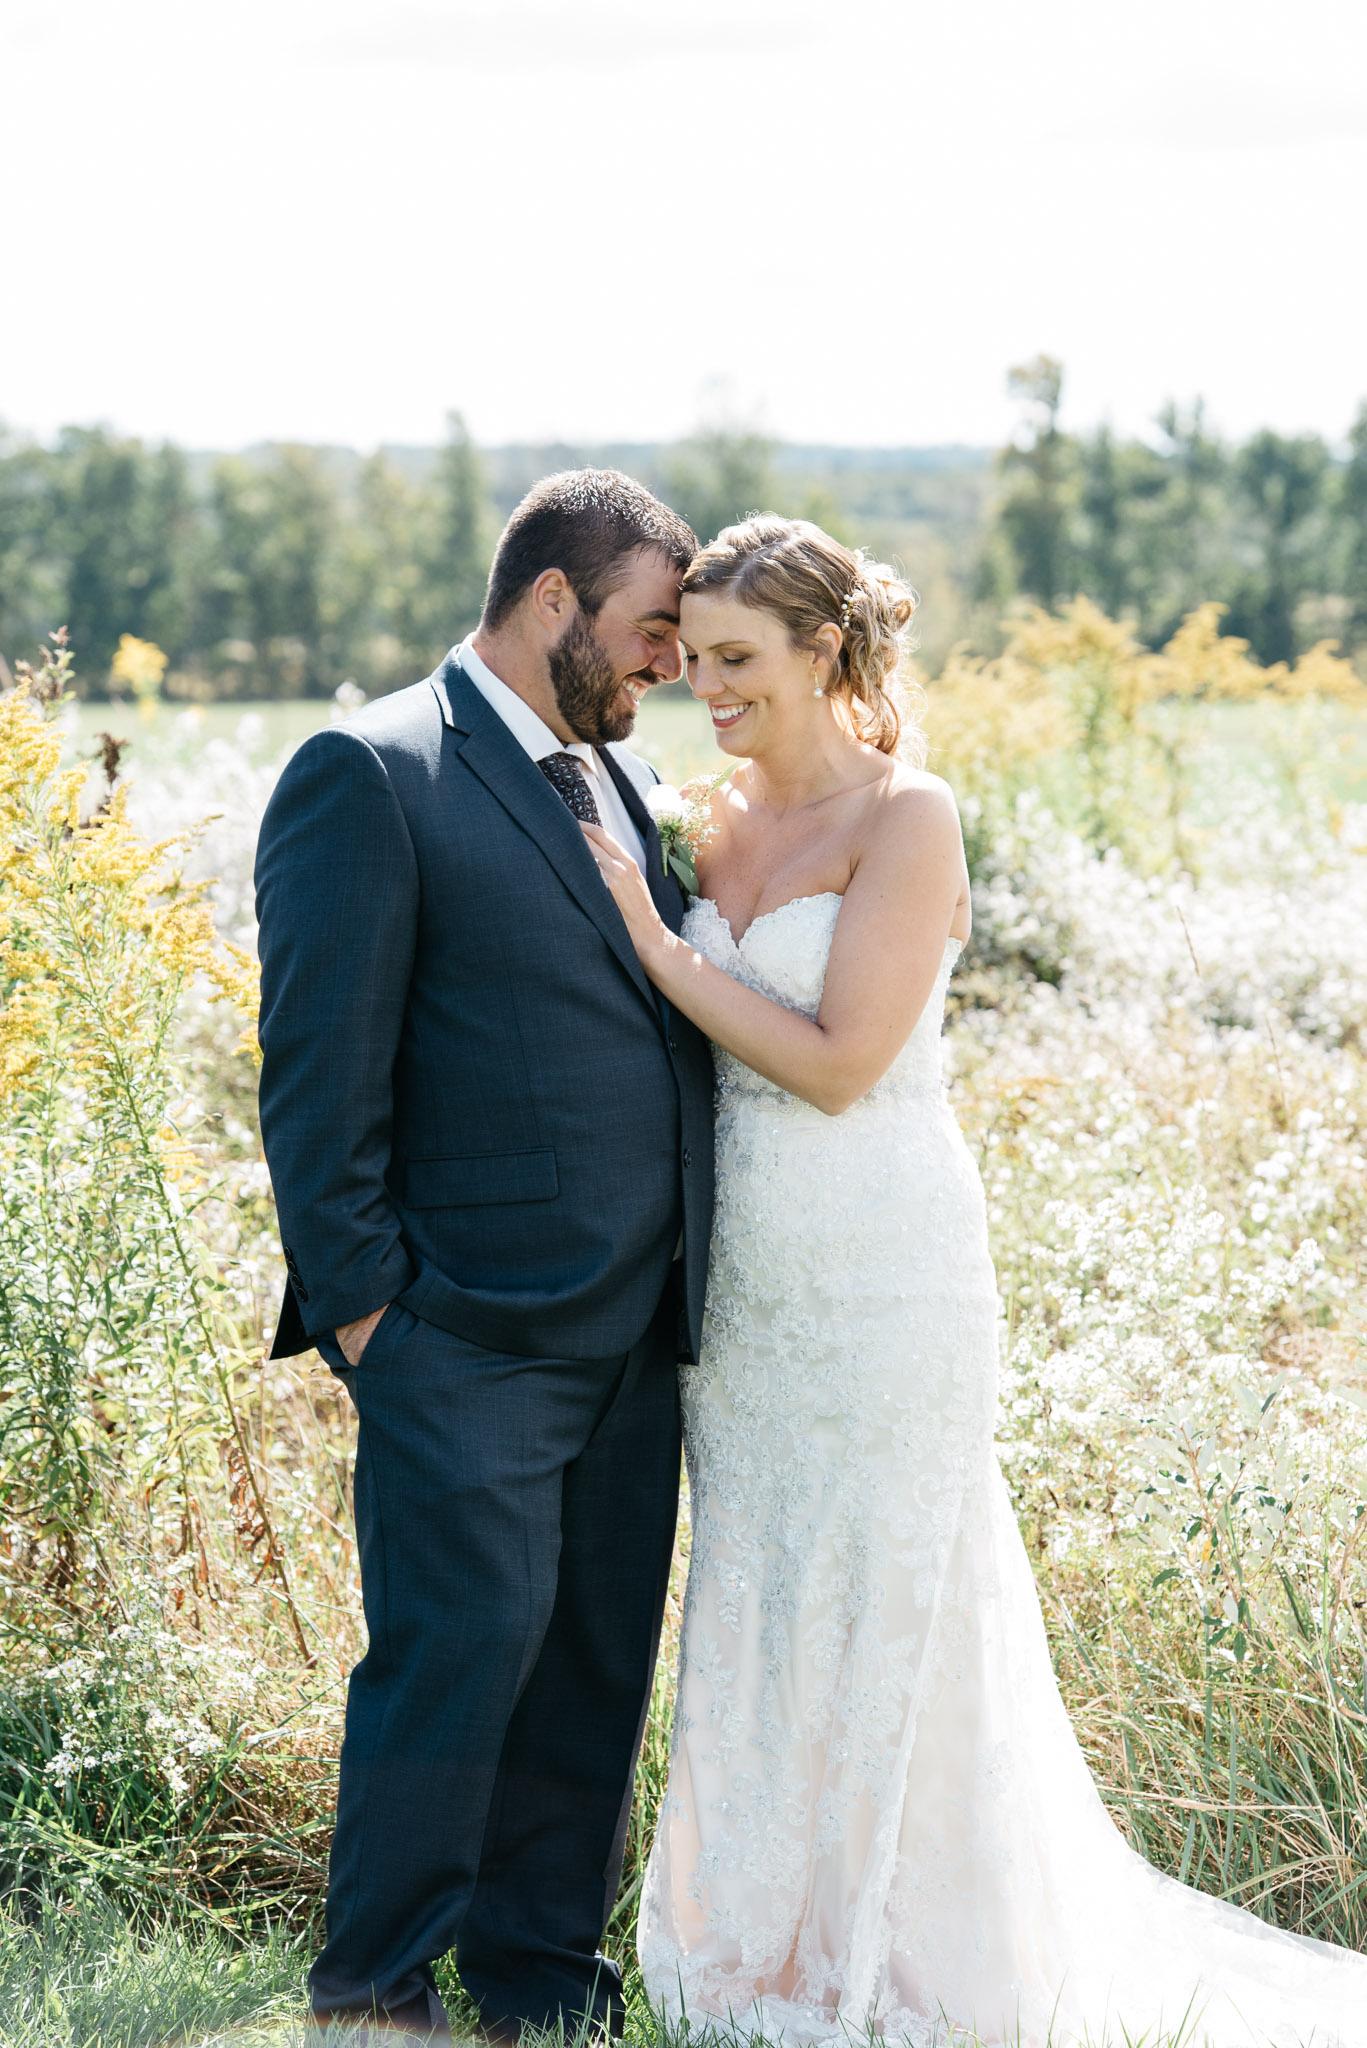 pittsburgh-ligonier-wedding-photographer-the-event-barn-at-highland-farms-3.jpg